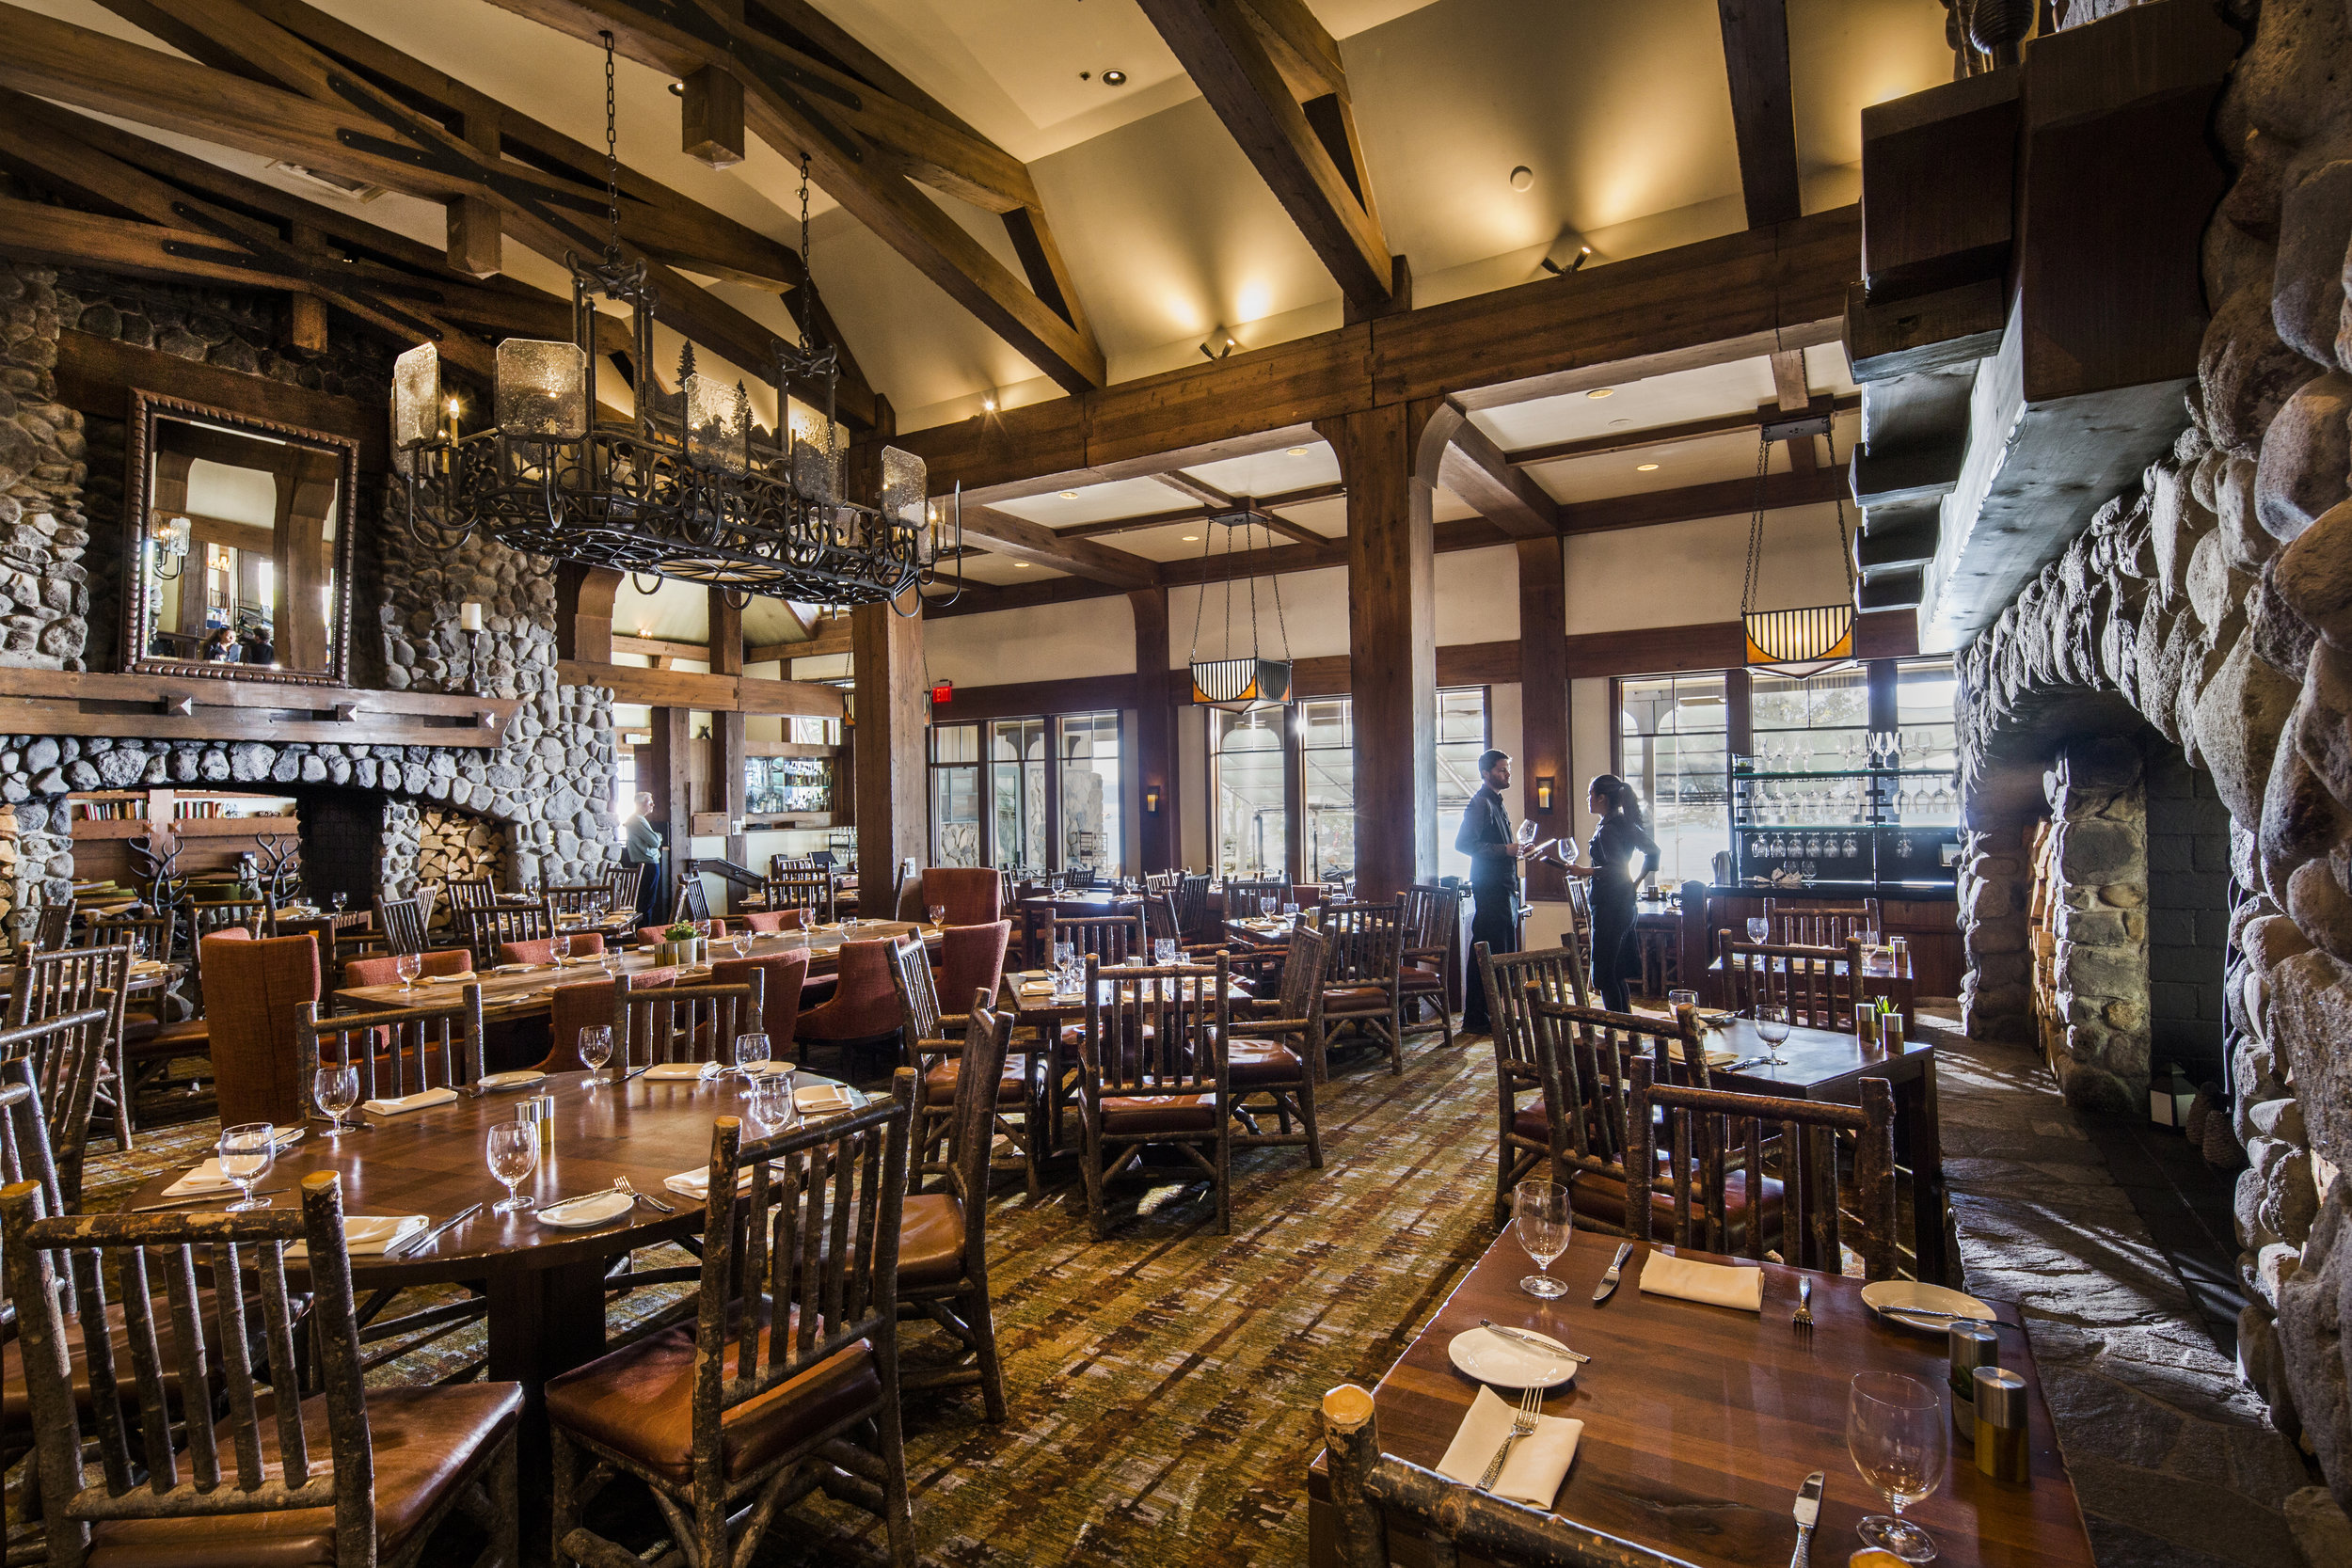 dow_63581lake tahoe hyatt lone eagle grill int dining room with less brt hero.jpg